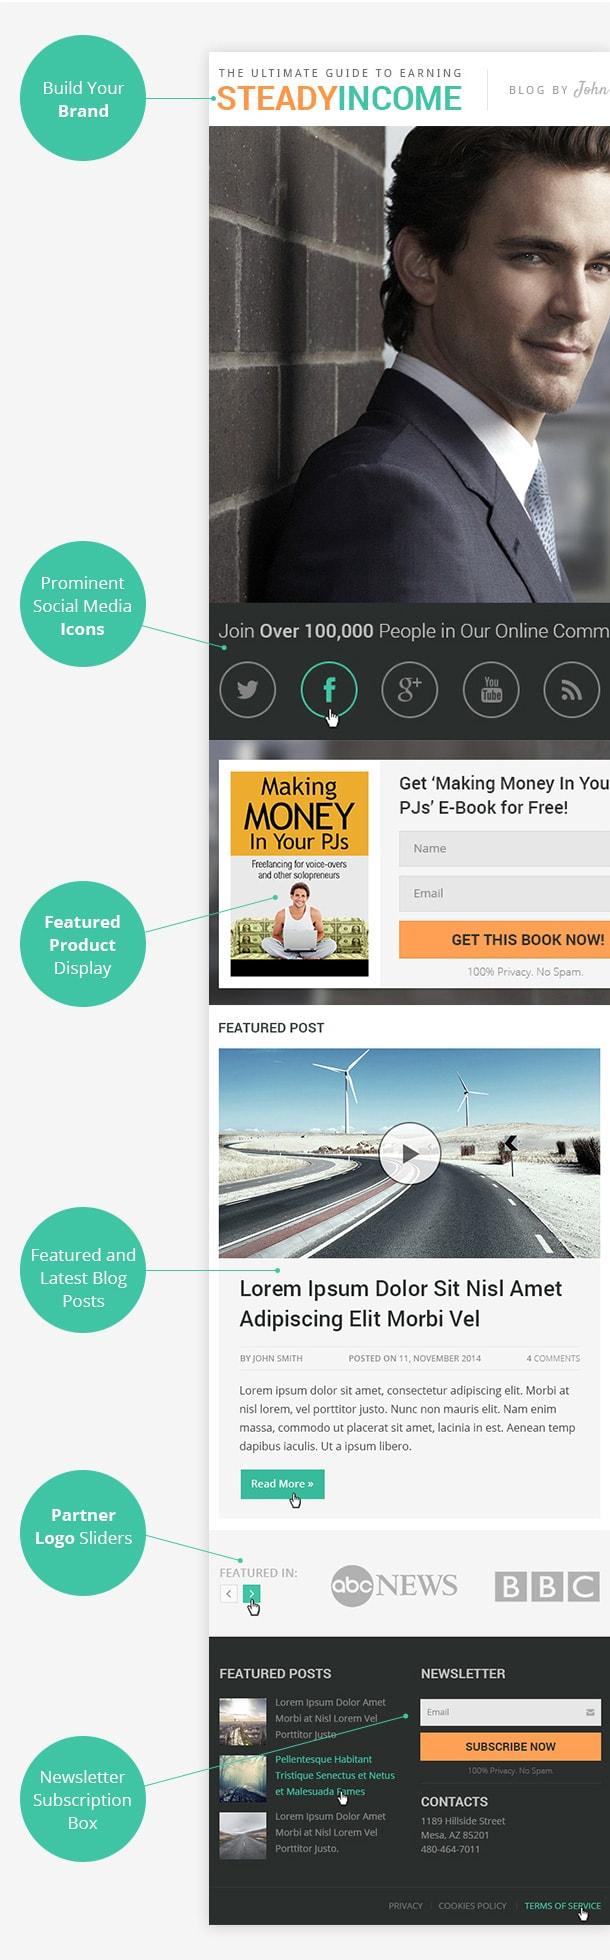 SteadyIncome Screenshot Homepage